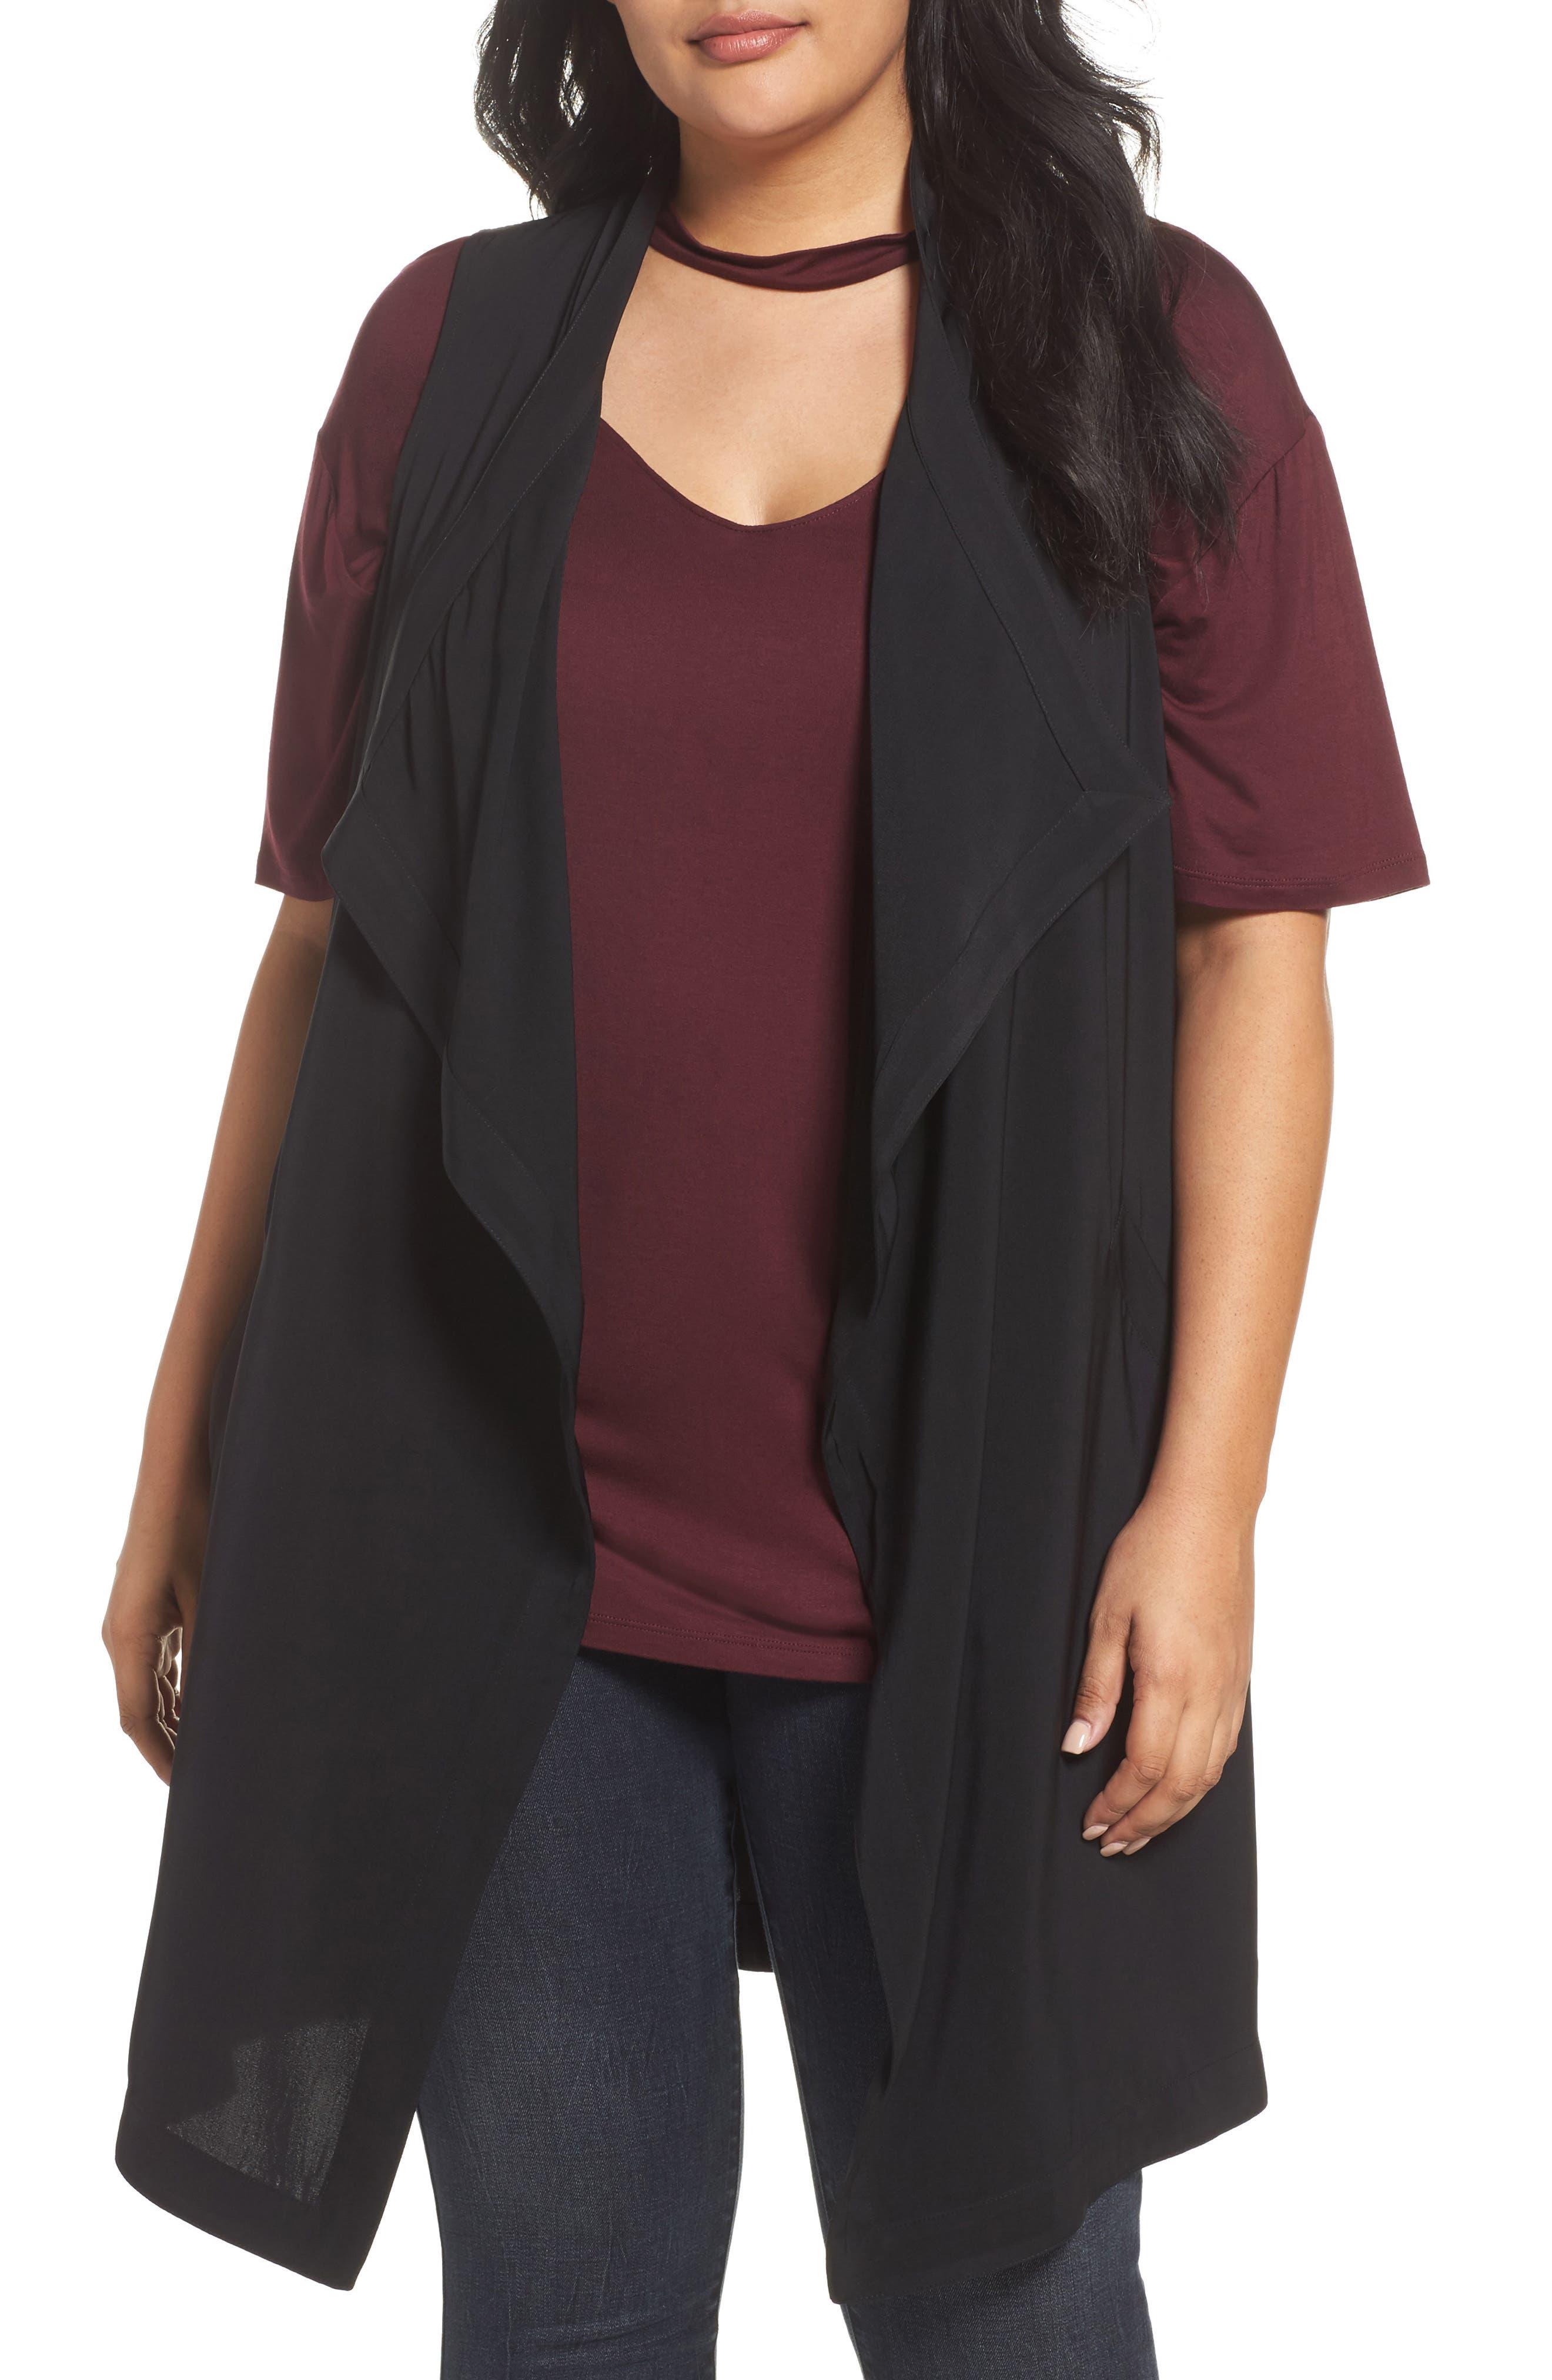 Alternate Image 1 Selected - REBEL WILSON X ANGELS Drape Front Vest (Plus Size)